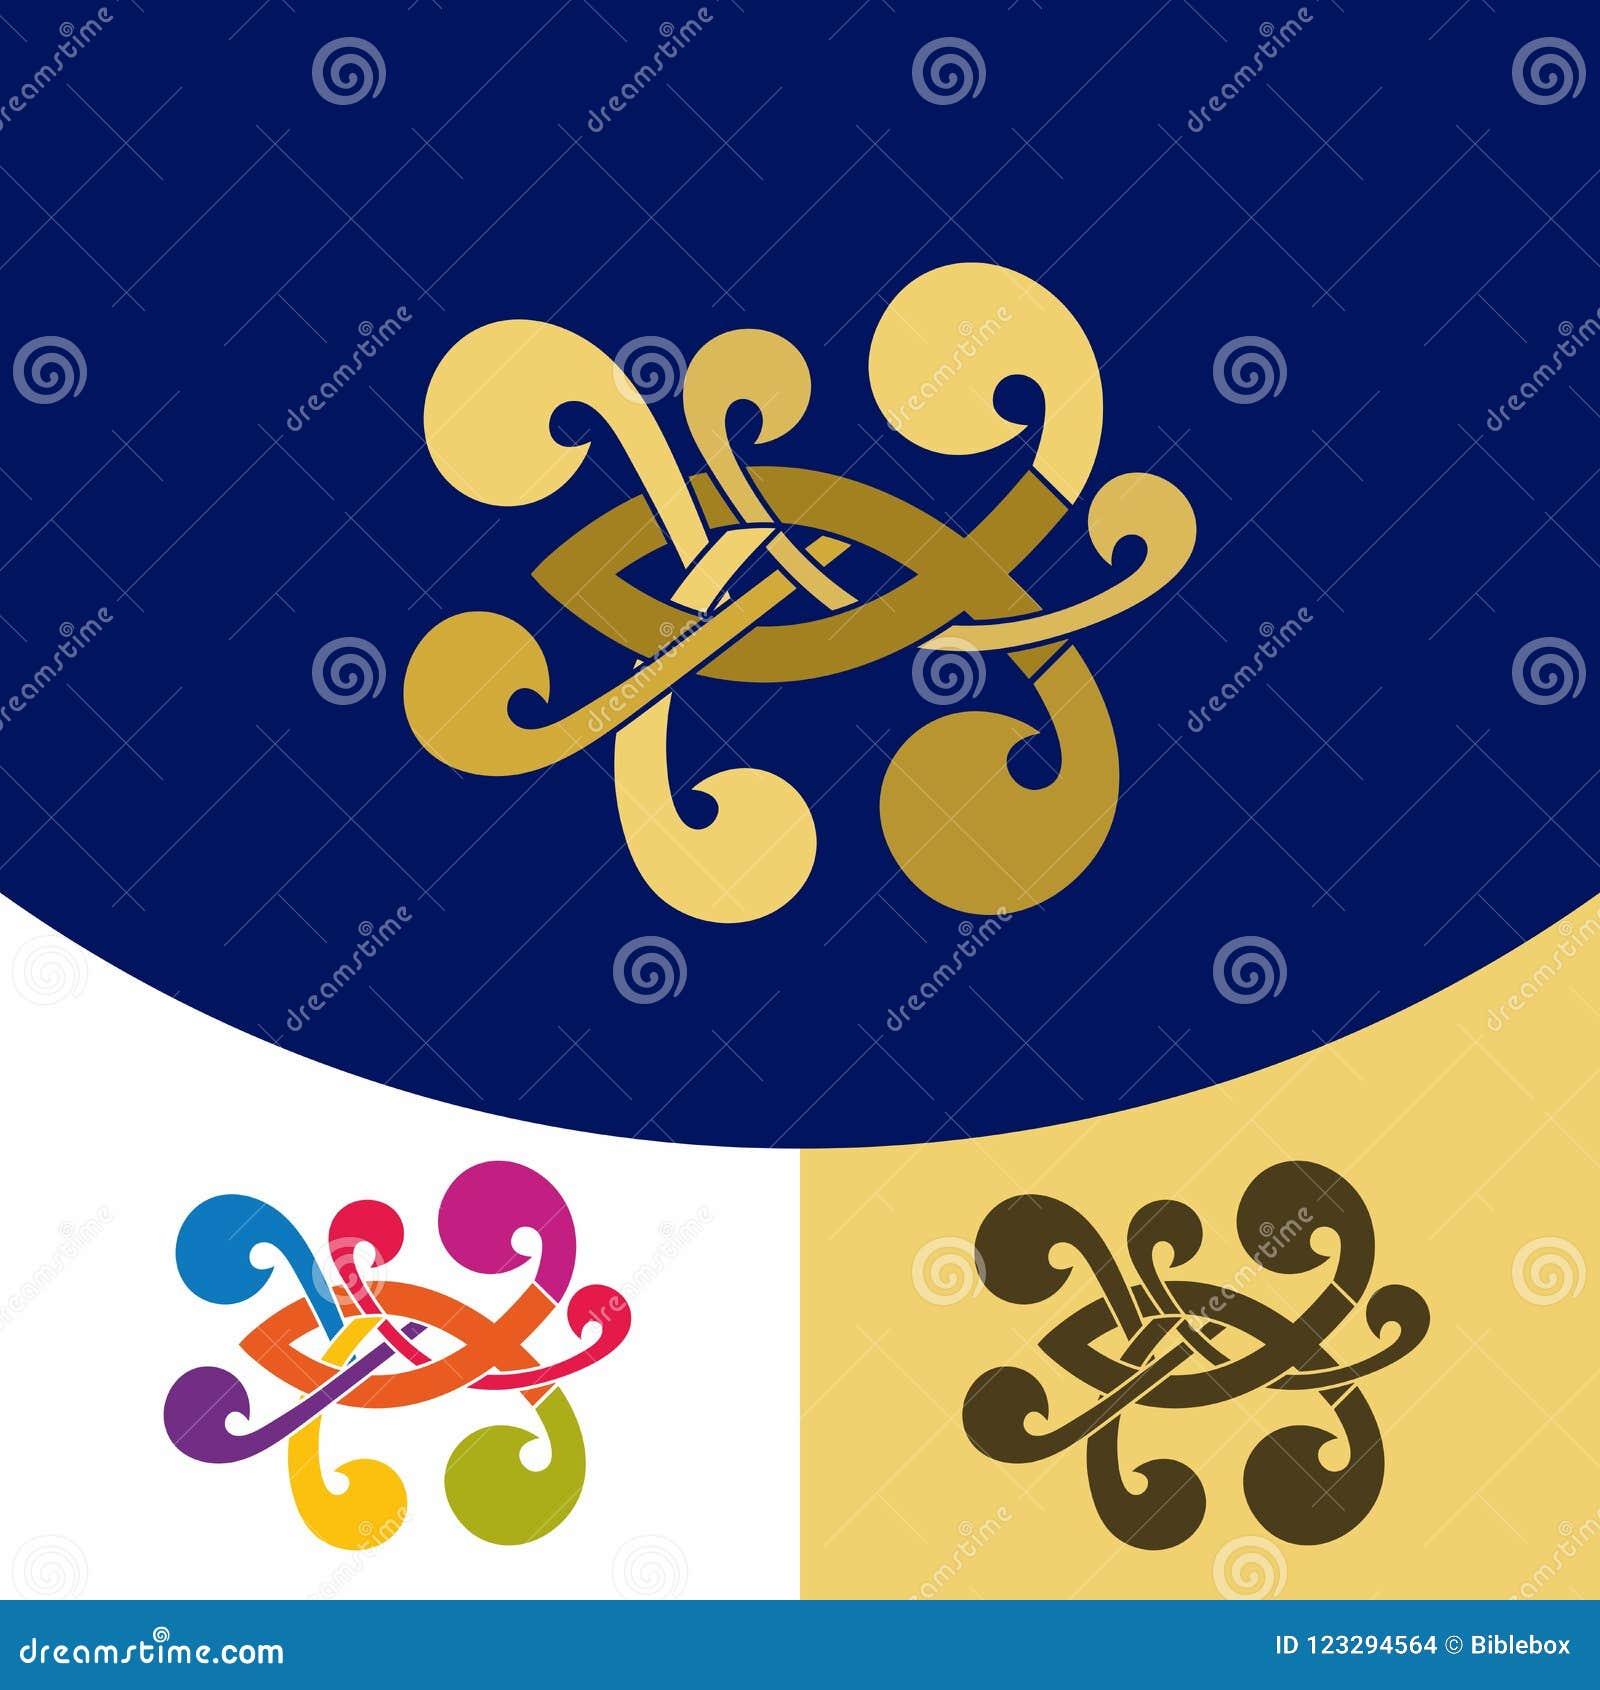 Church Logo Christian Symbols Fish A Symbol Of Jesus Christ And